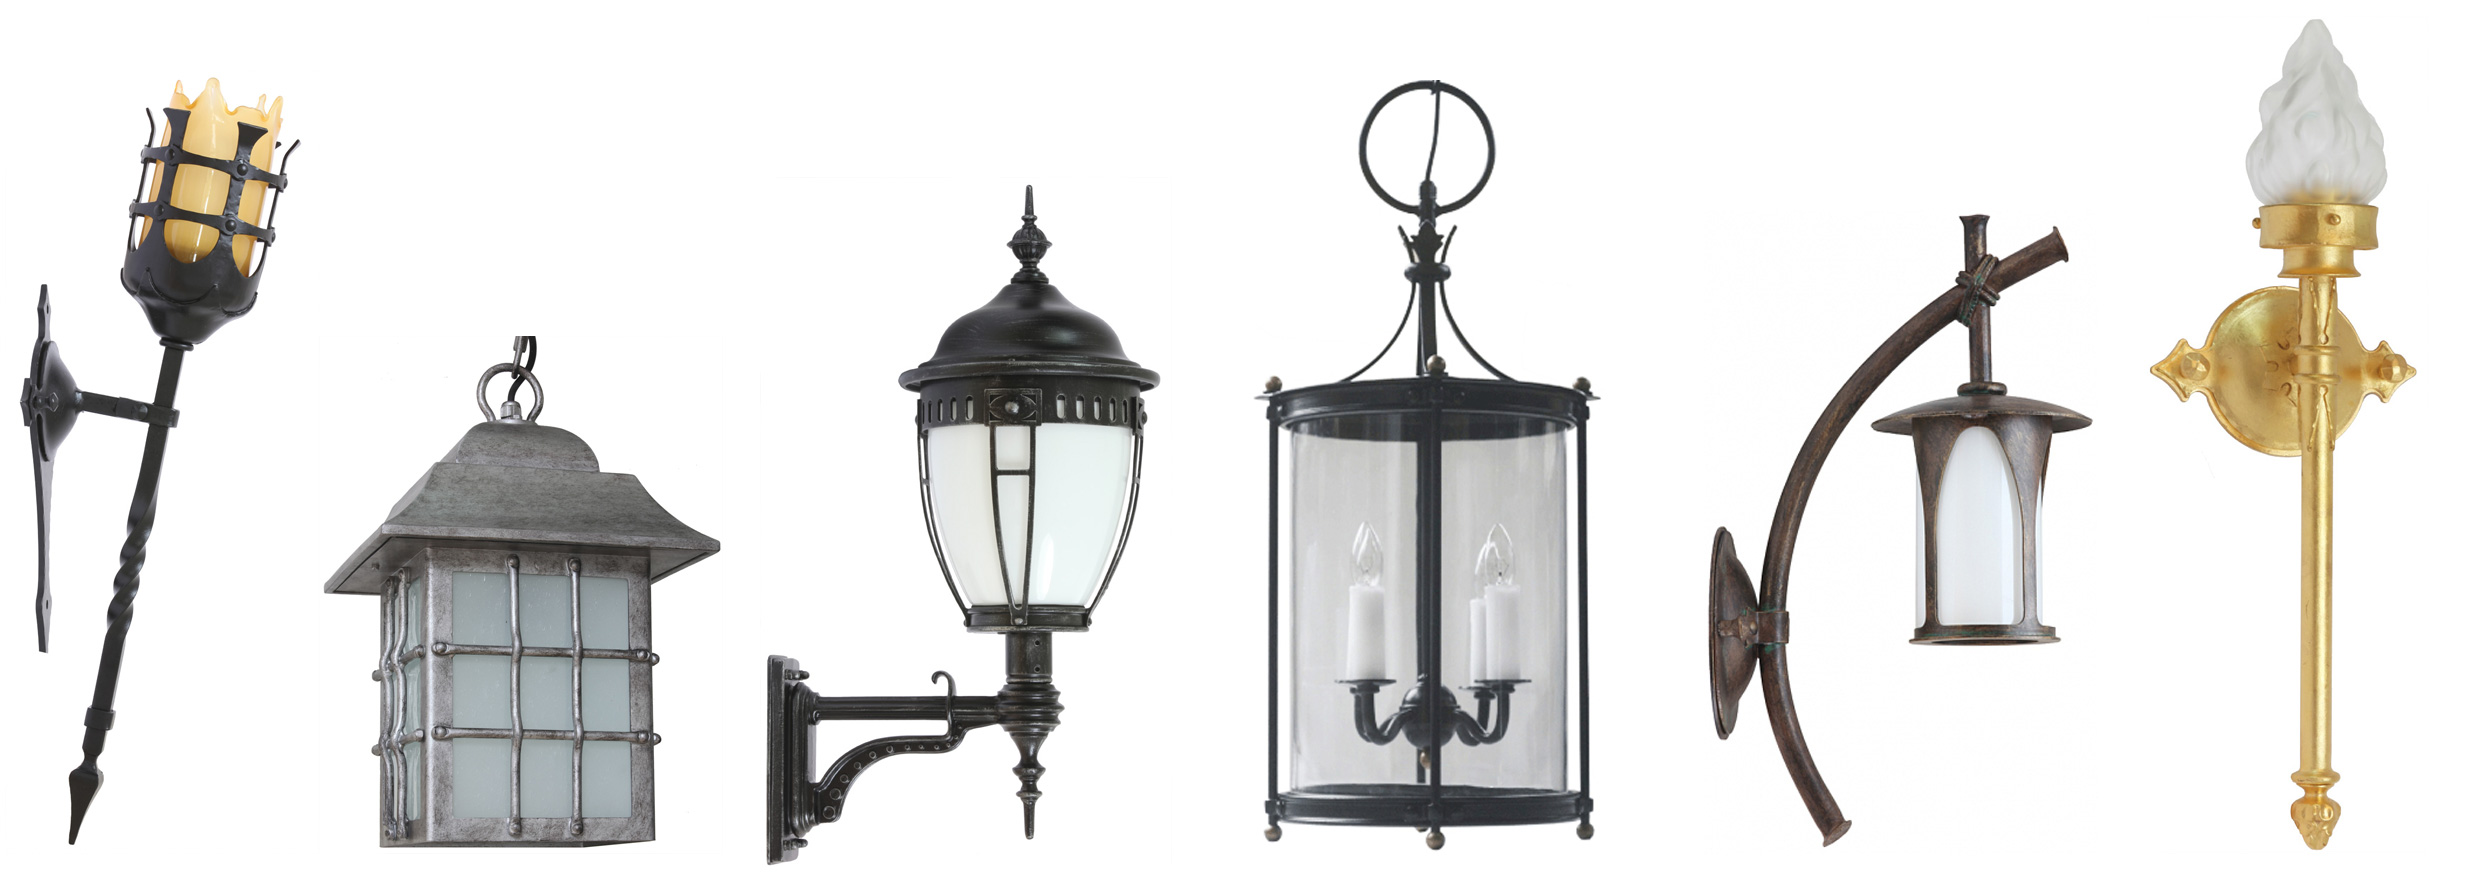 Rustikale au enbeleuchtung klassisch und historisch - Aussenbeleuchtungen garten ...